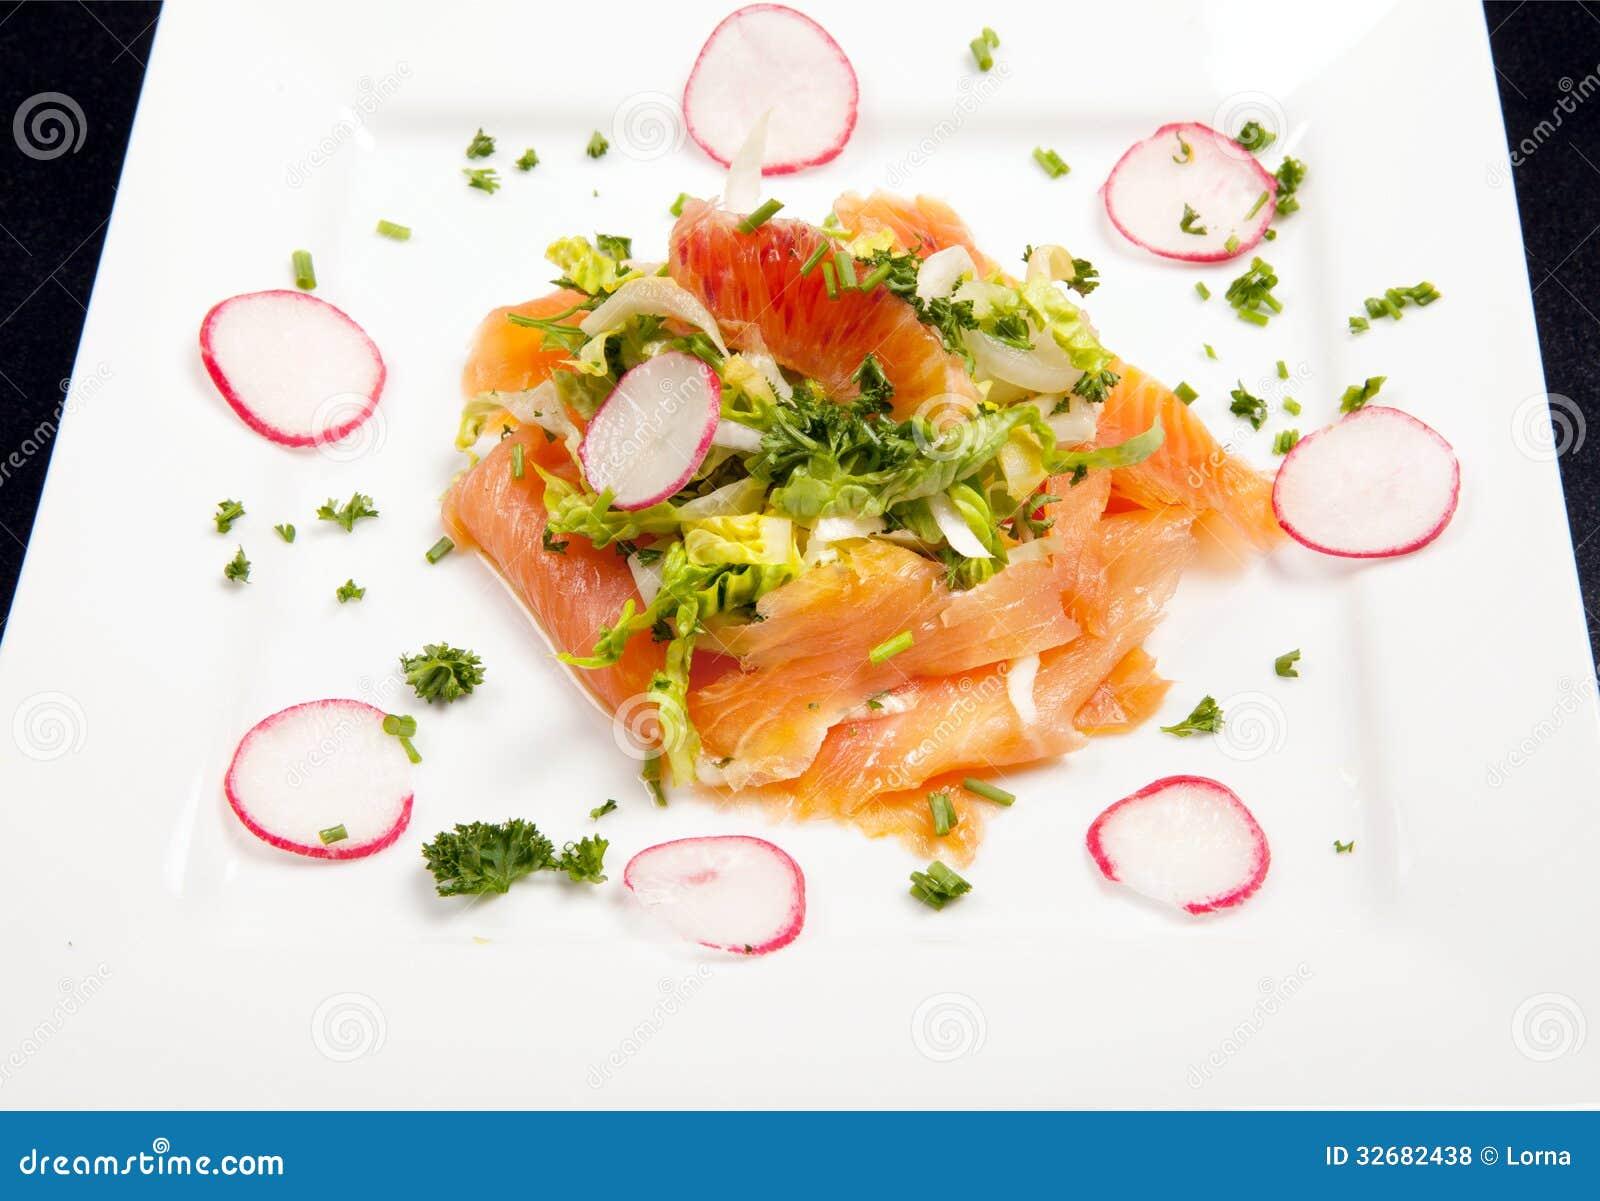 salad grilled salmon and grapefruit blood orange roasted salmon blood ...